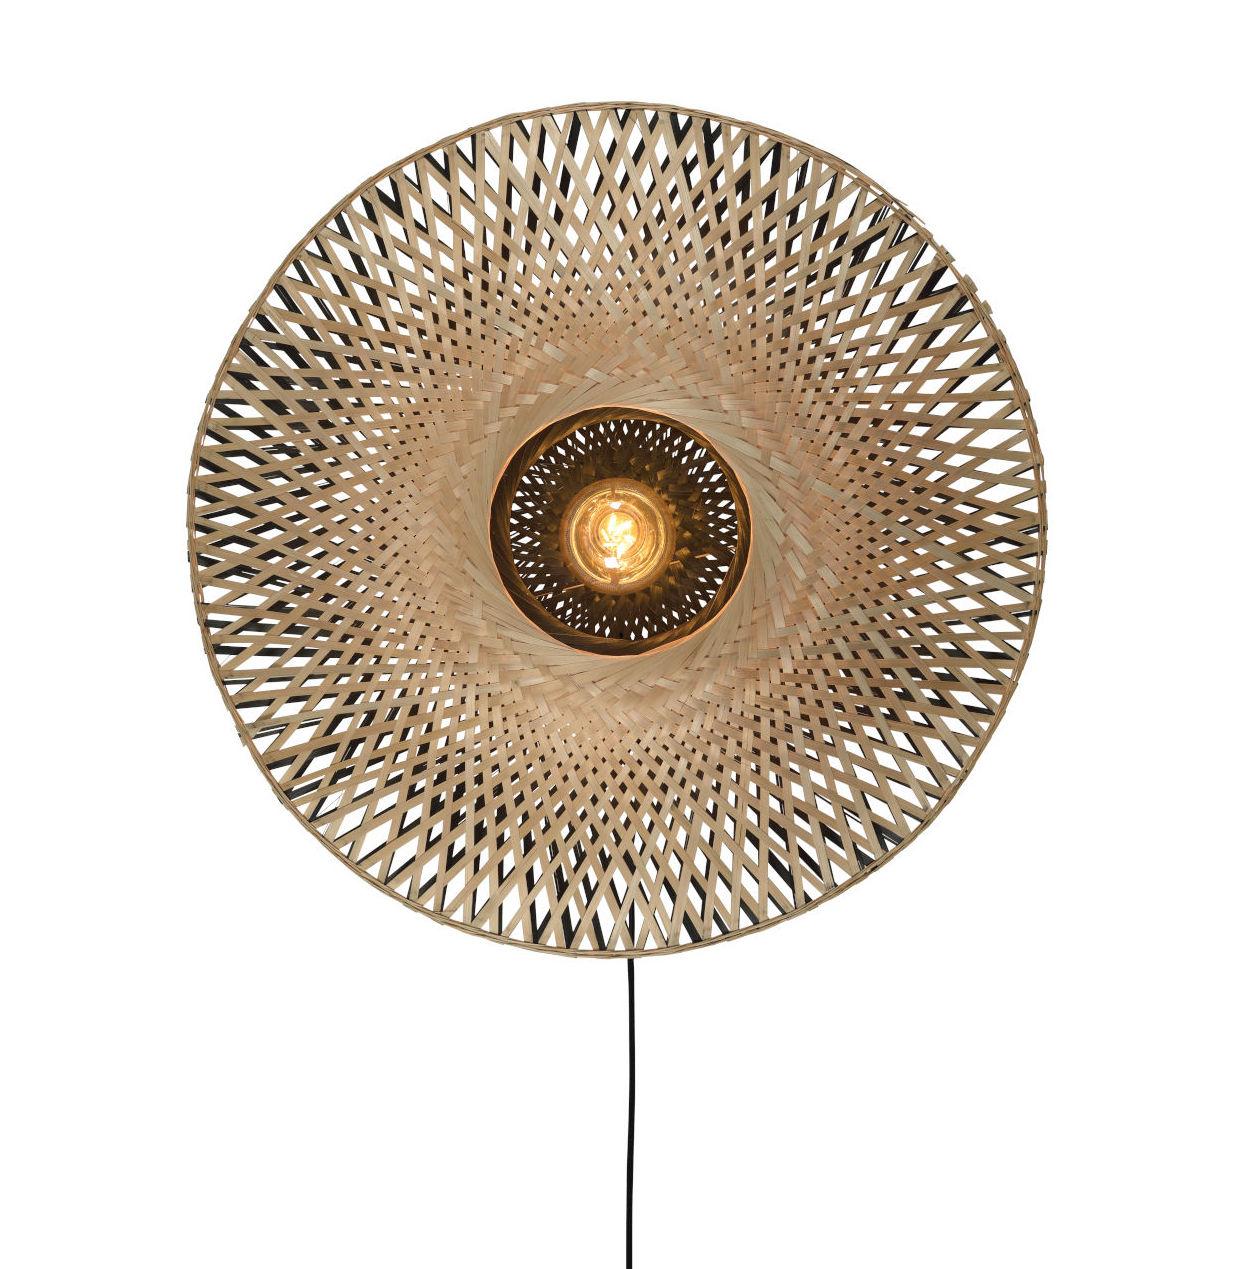 Lighting - Wall Lights - Kalimantan Wall light with plug - / Bamboo - Ø 60 cm by GOOD&MOJO - H 60 cm / Black & natural - Bamboo